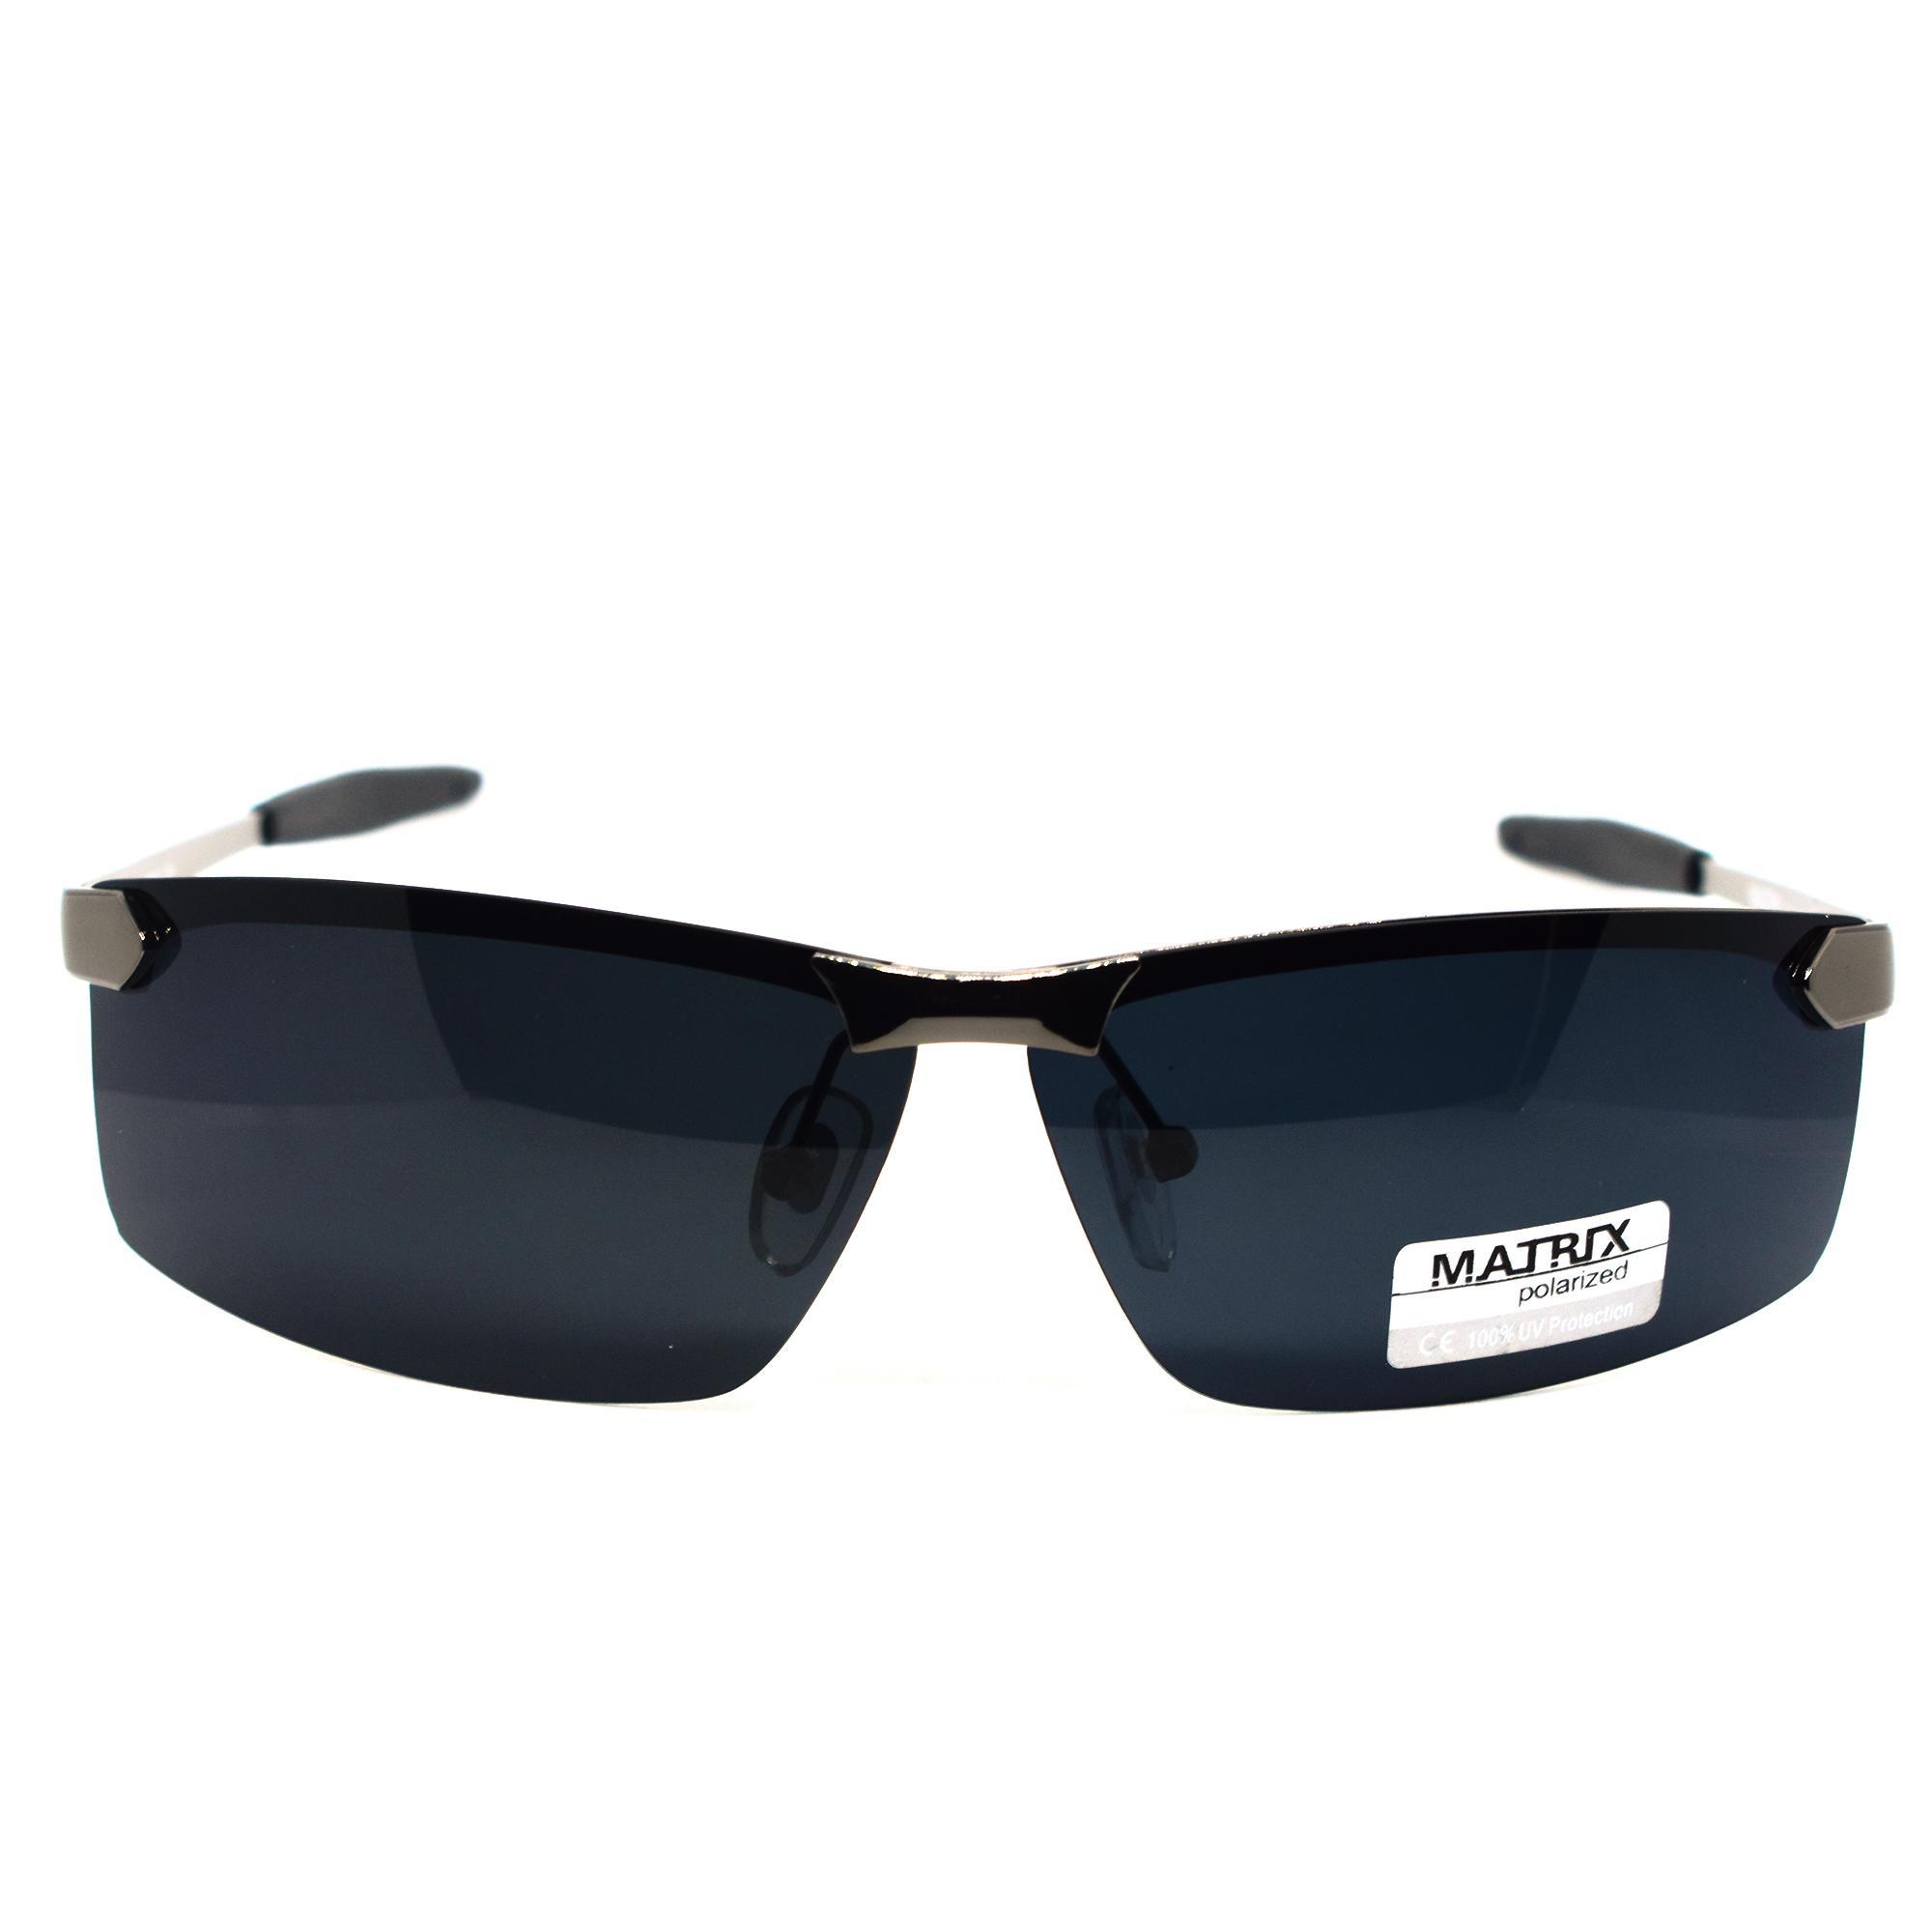 9195641a651 Matrix polarized 100% UV Protection Black Color Men s   Women s Sunglasses